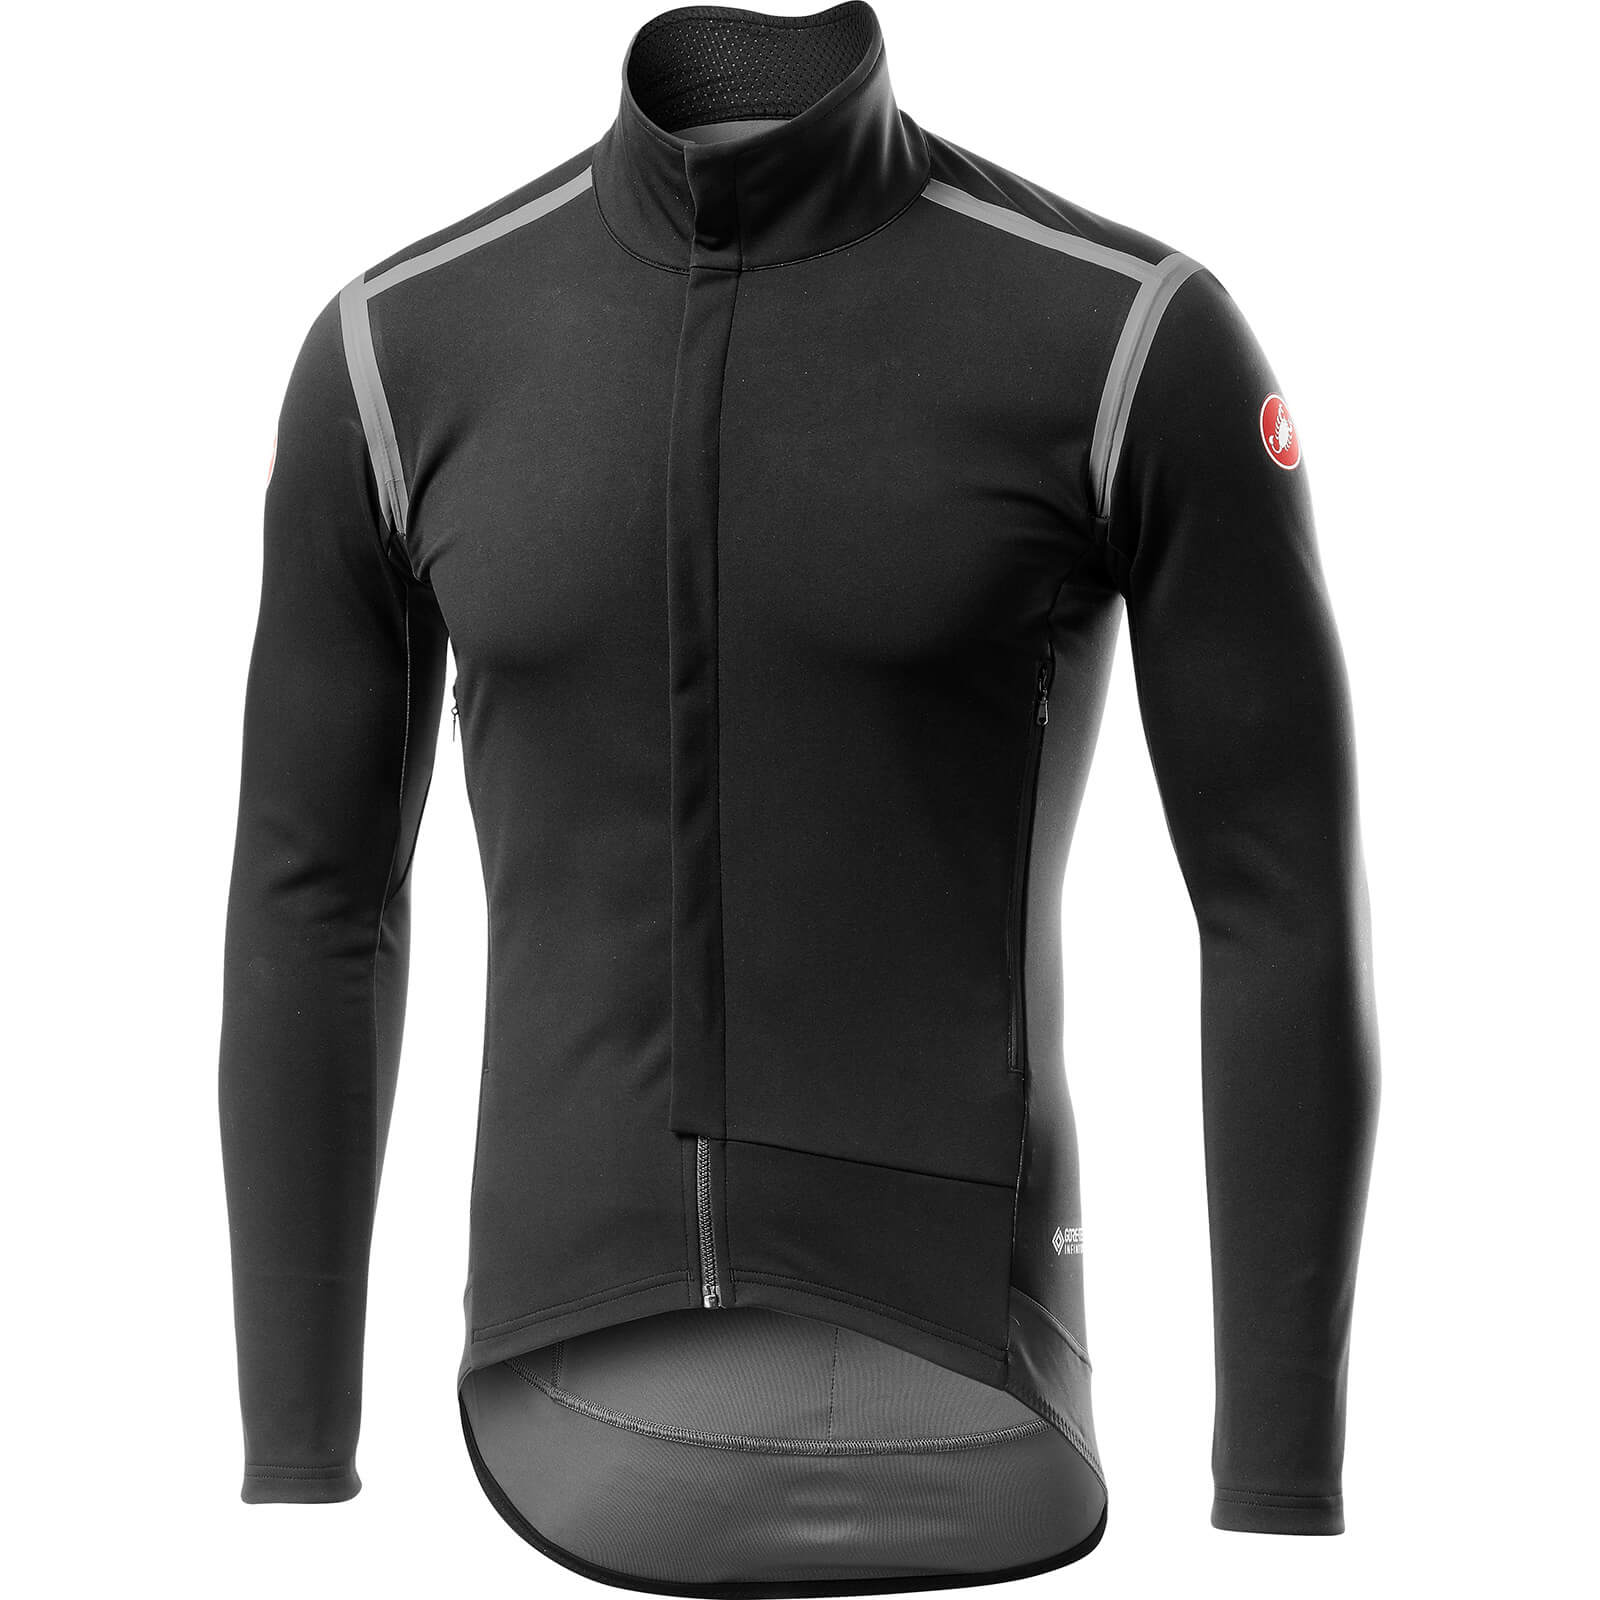 Castelli Perfetto RoS Long Sleeve Jacket - M - Light Black